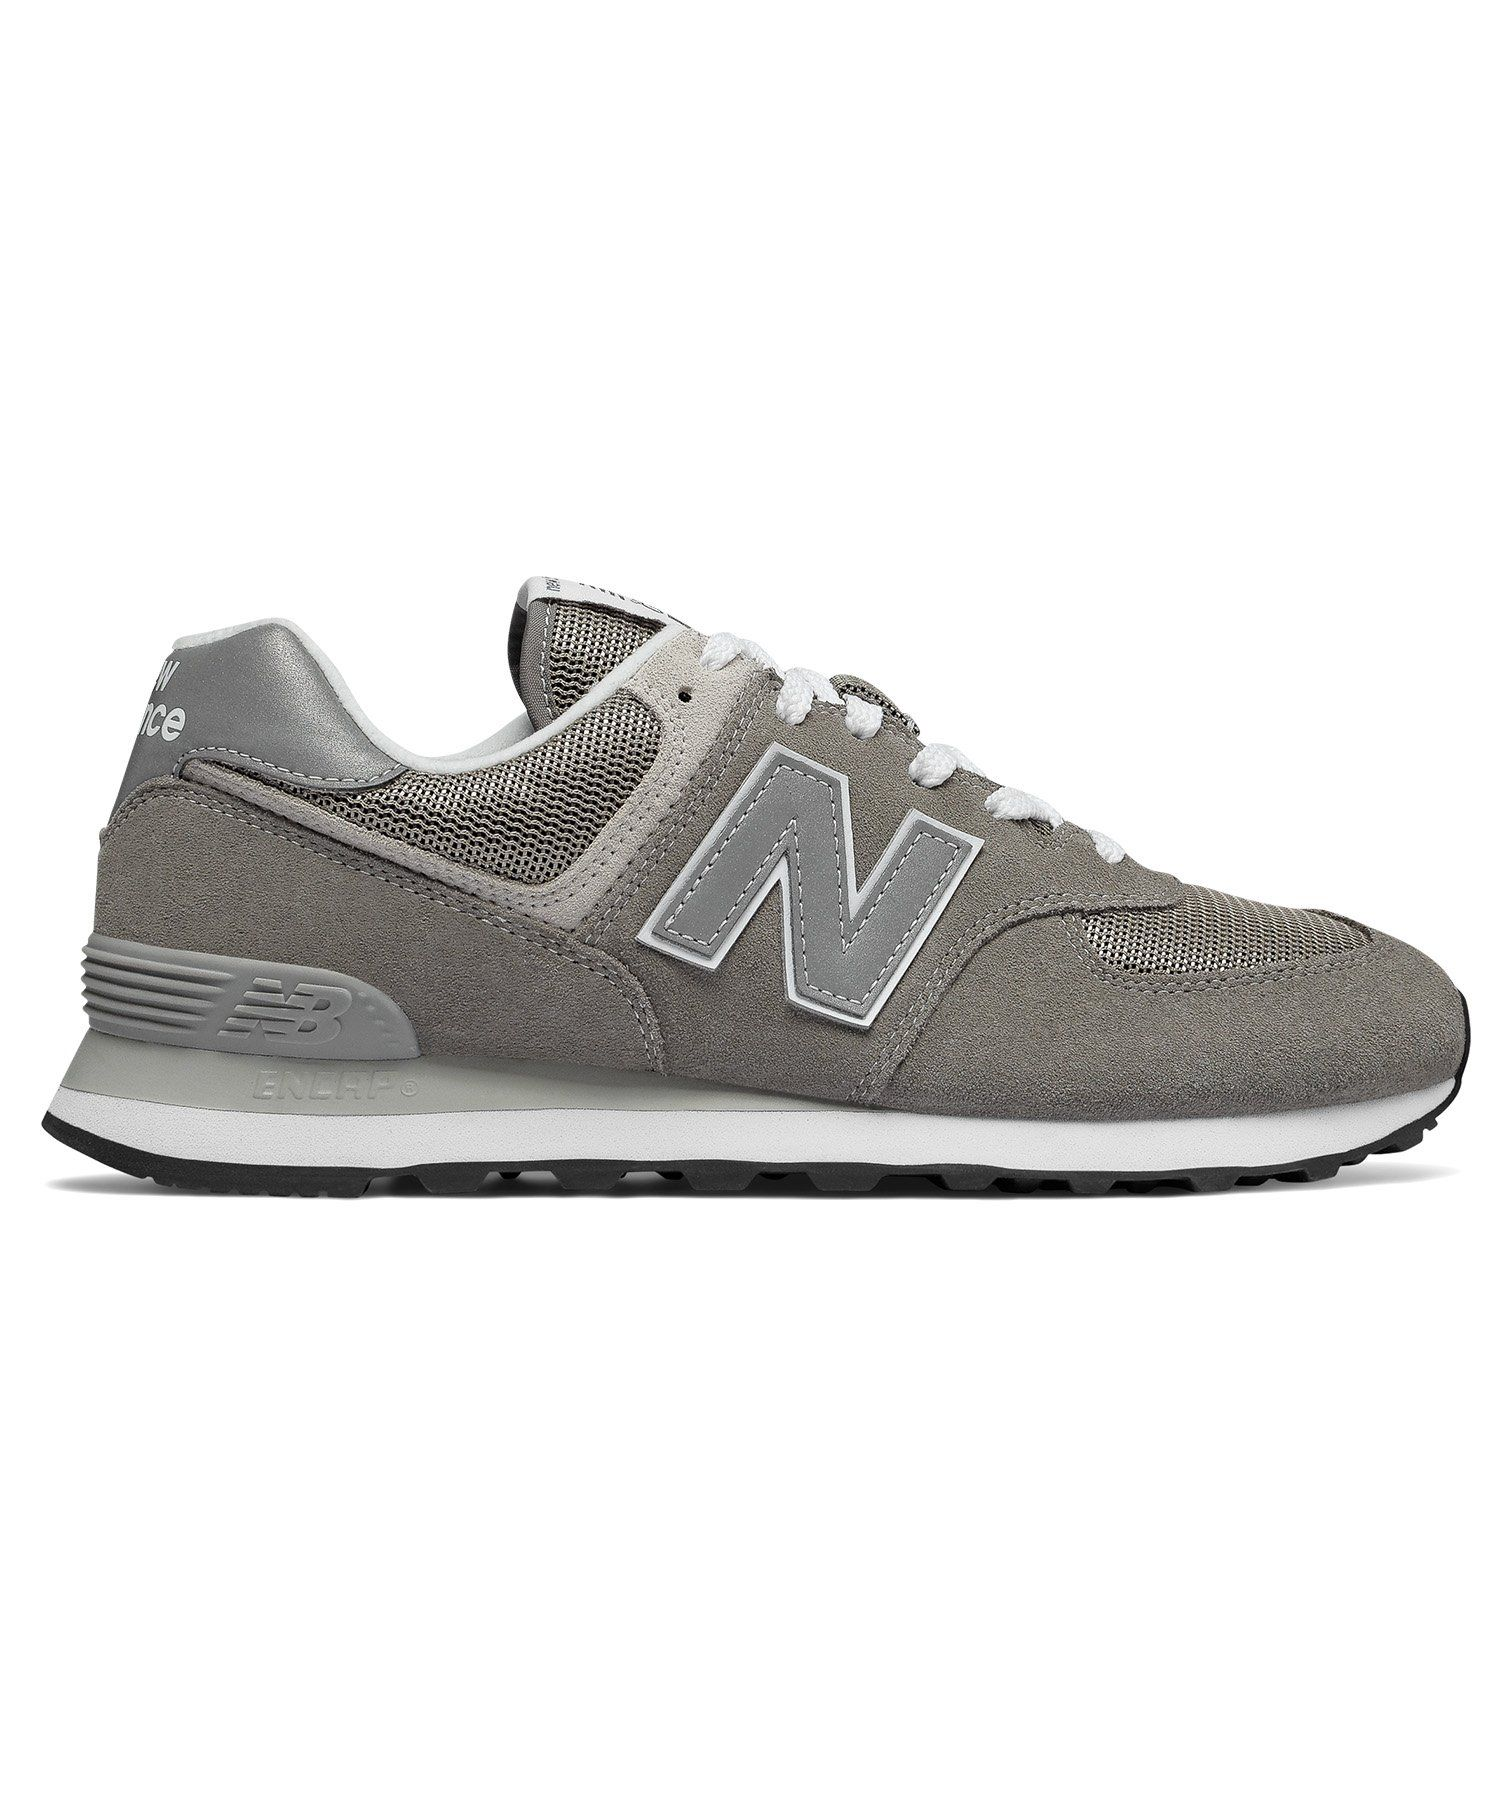 New Balance 574 Iconic Grey Mens New Balance 574 New Balance New Balance 574 Grey